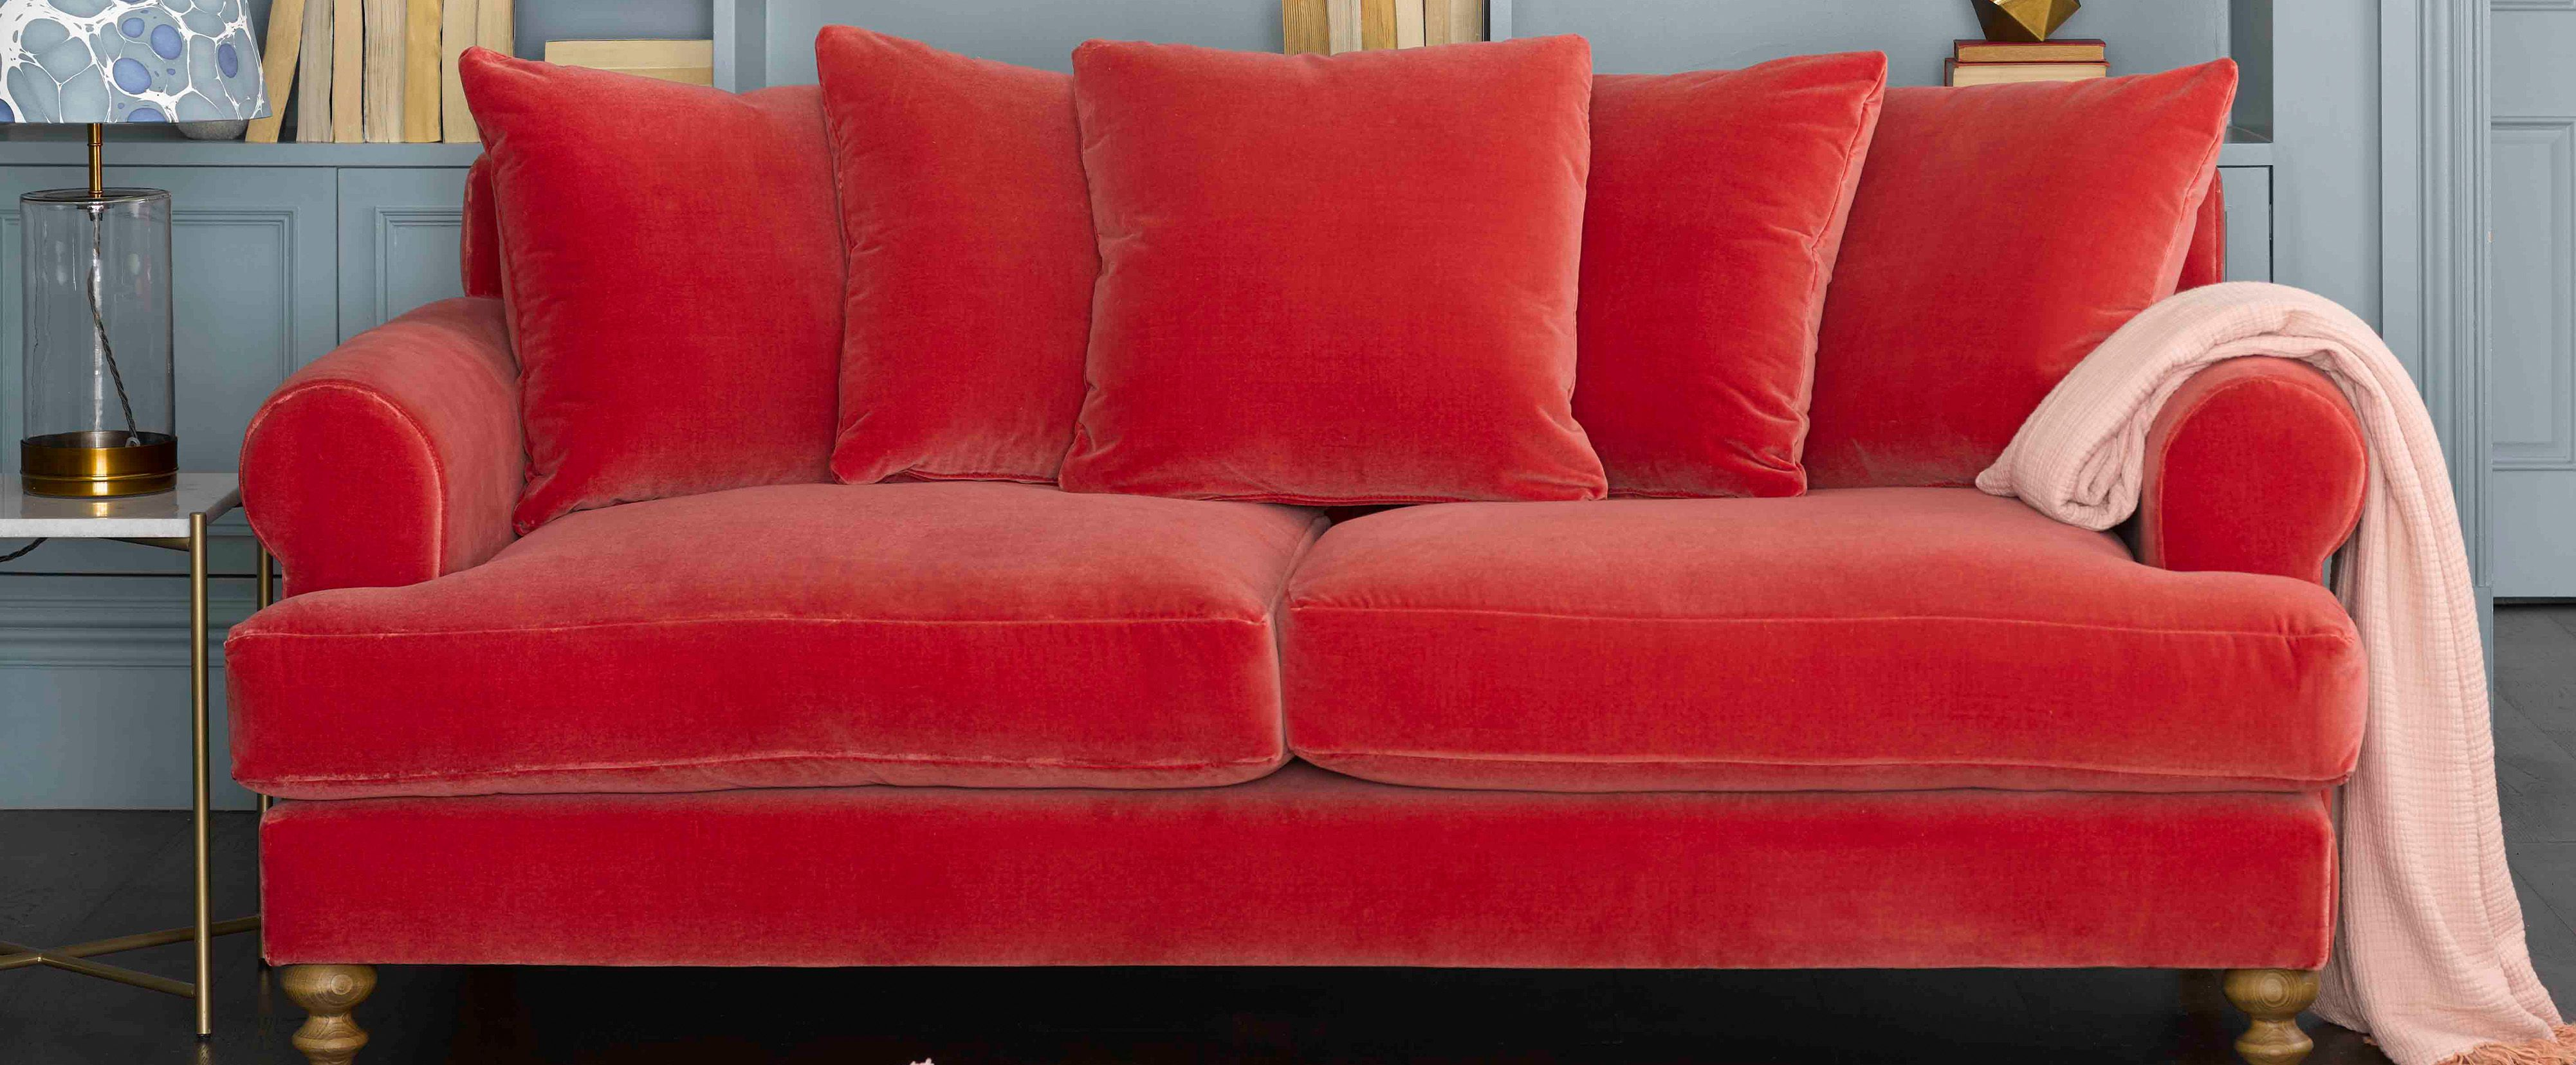 three-seat-sofa.jpg